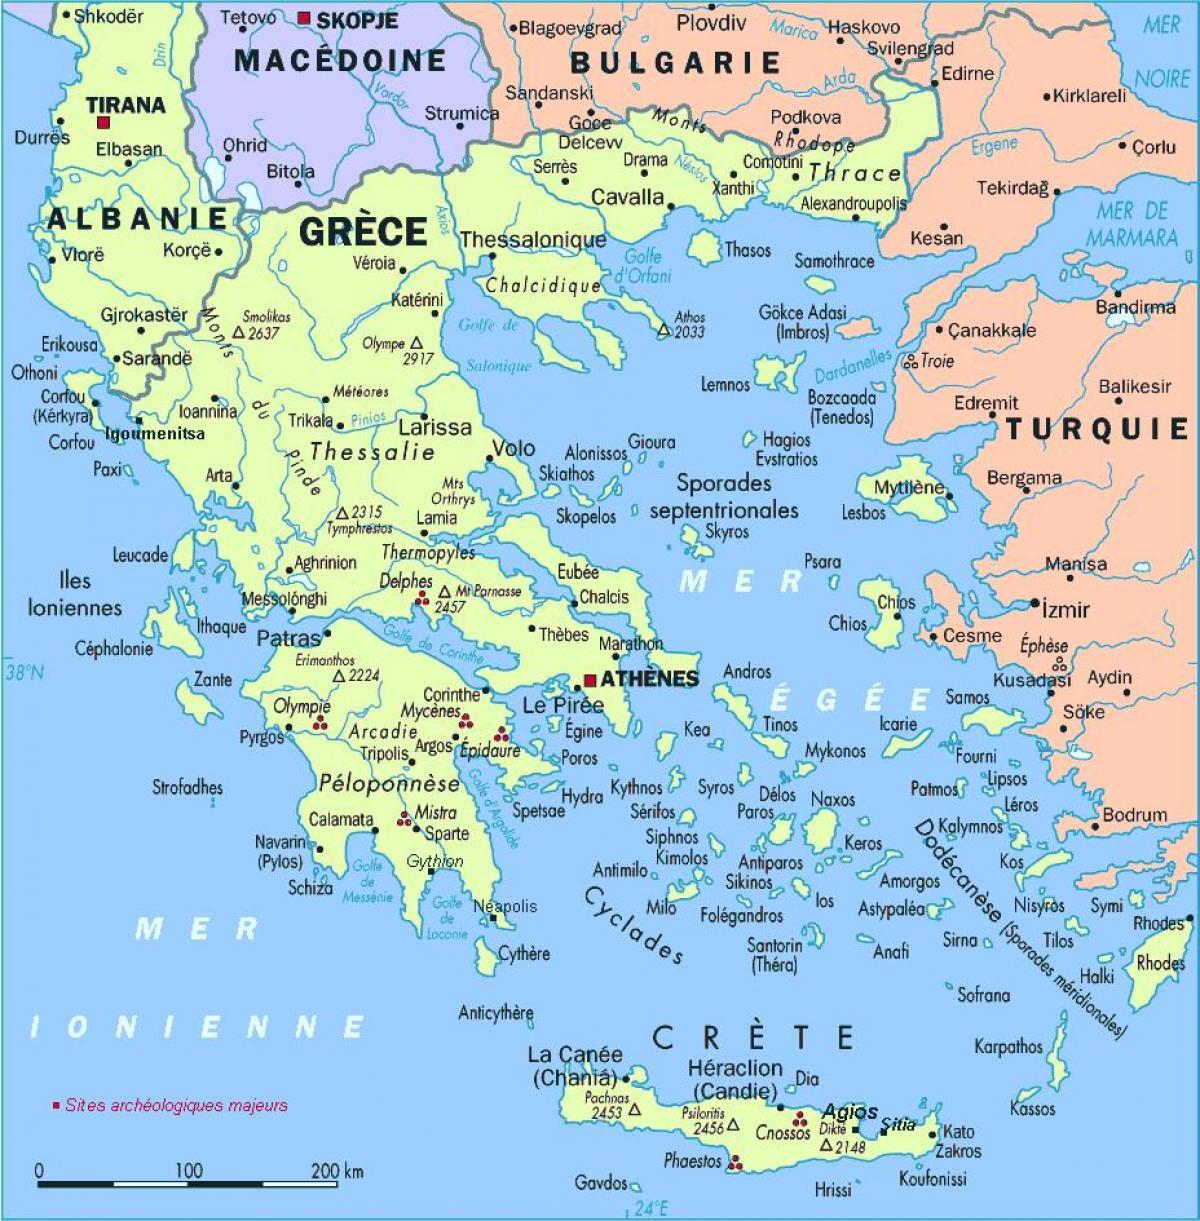 Karta Grcke Detaljna Karta Grcke Juzna Europa Europa